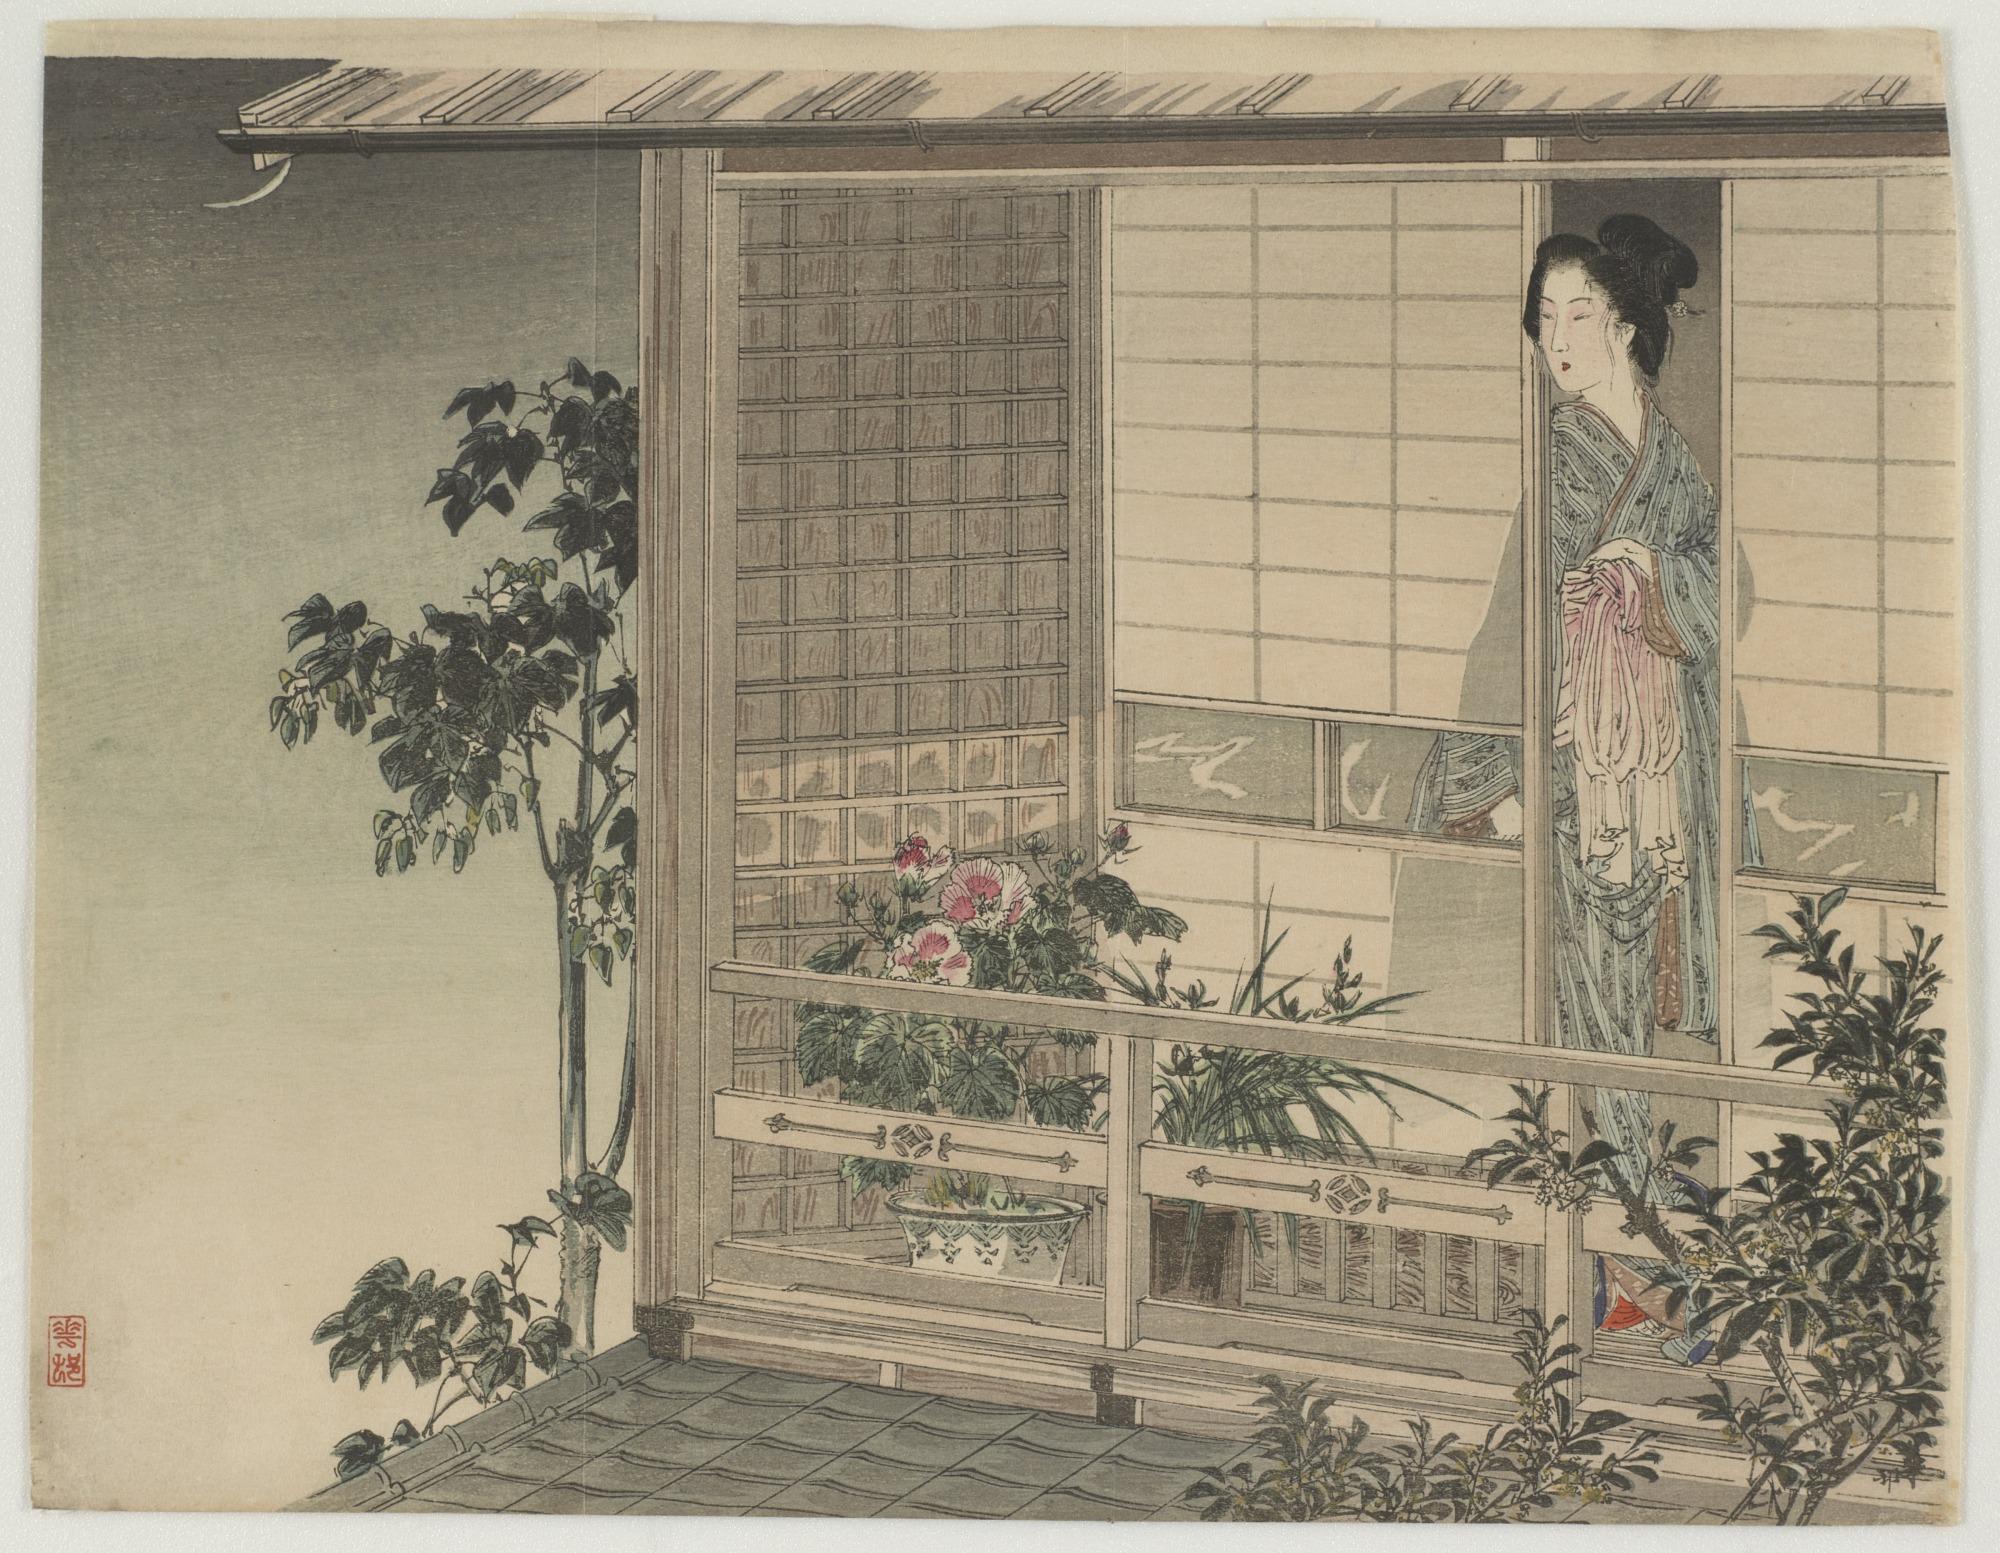 Woman on the veranda